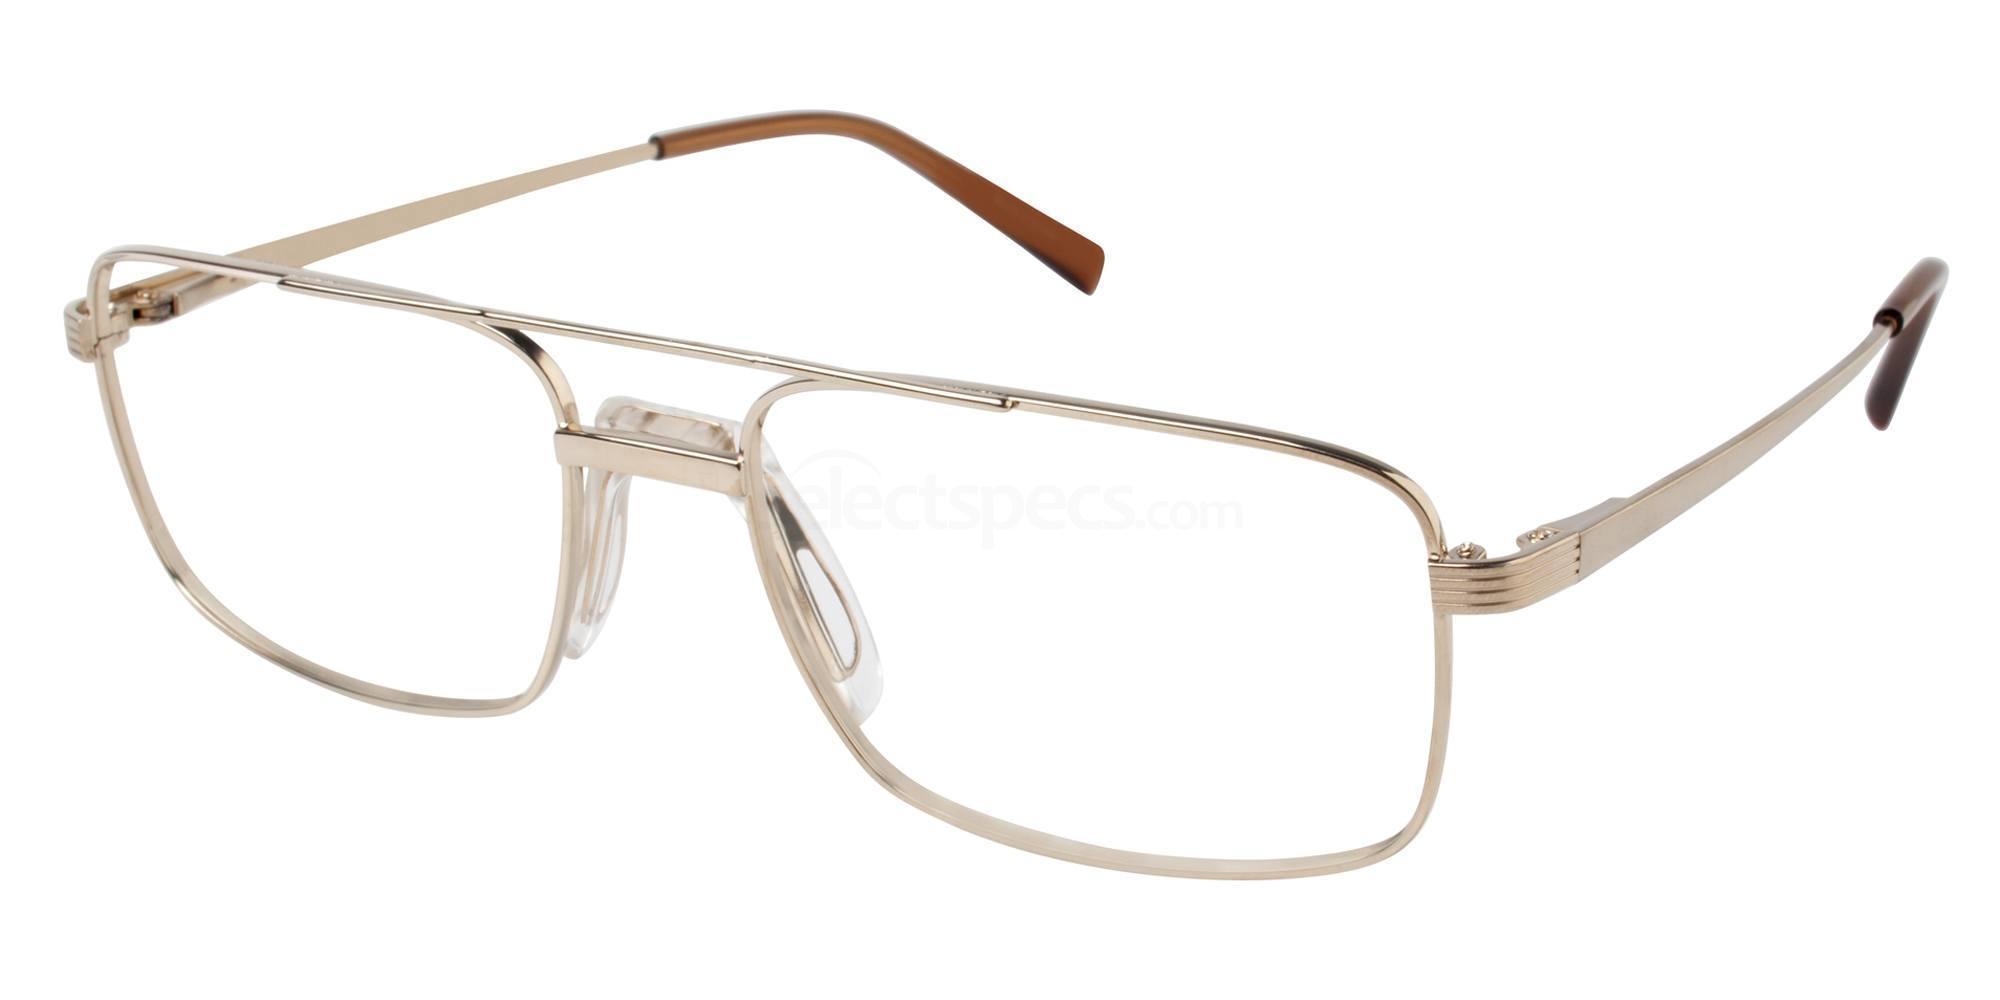 Brad Pitt Wears Retro Glasses in The Big Short